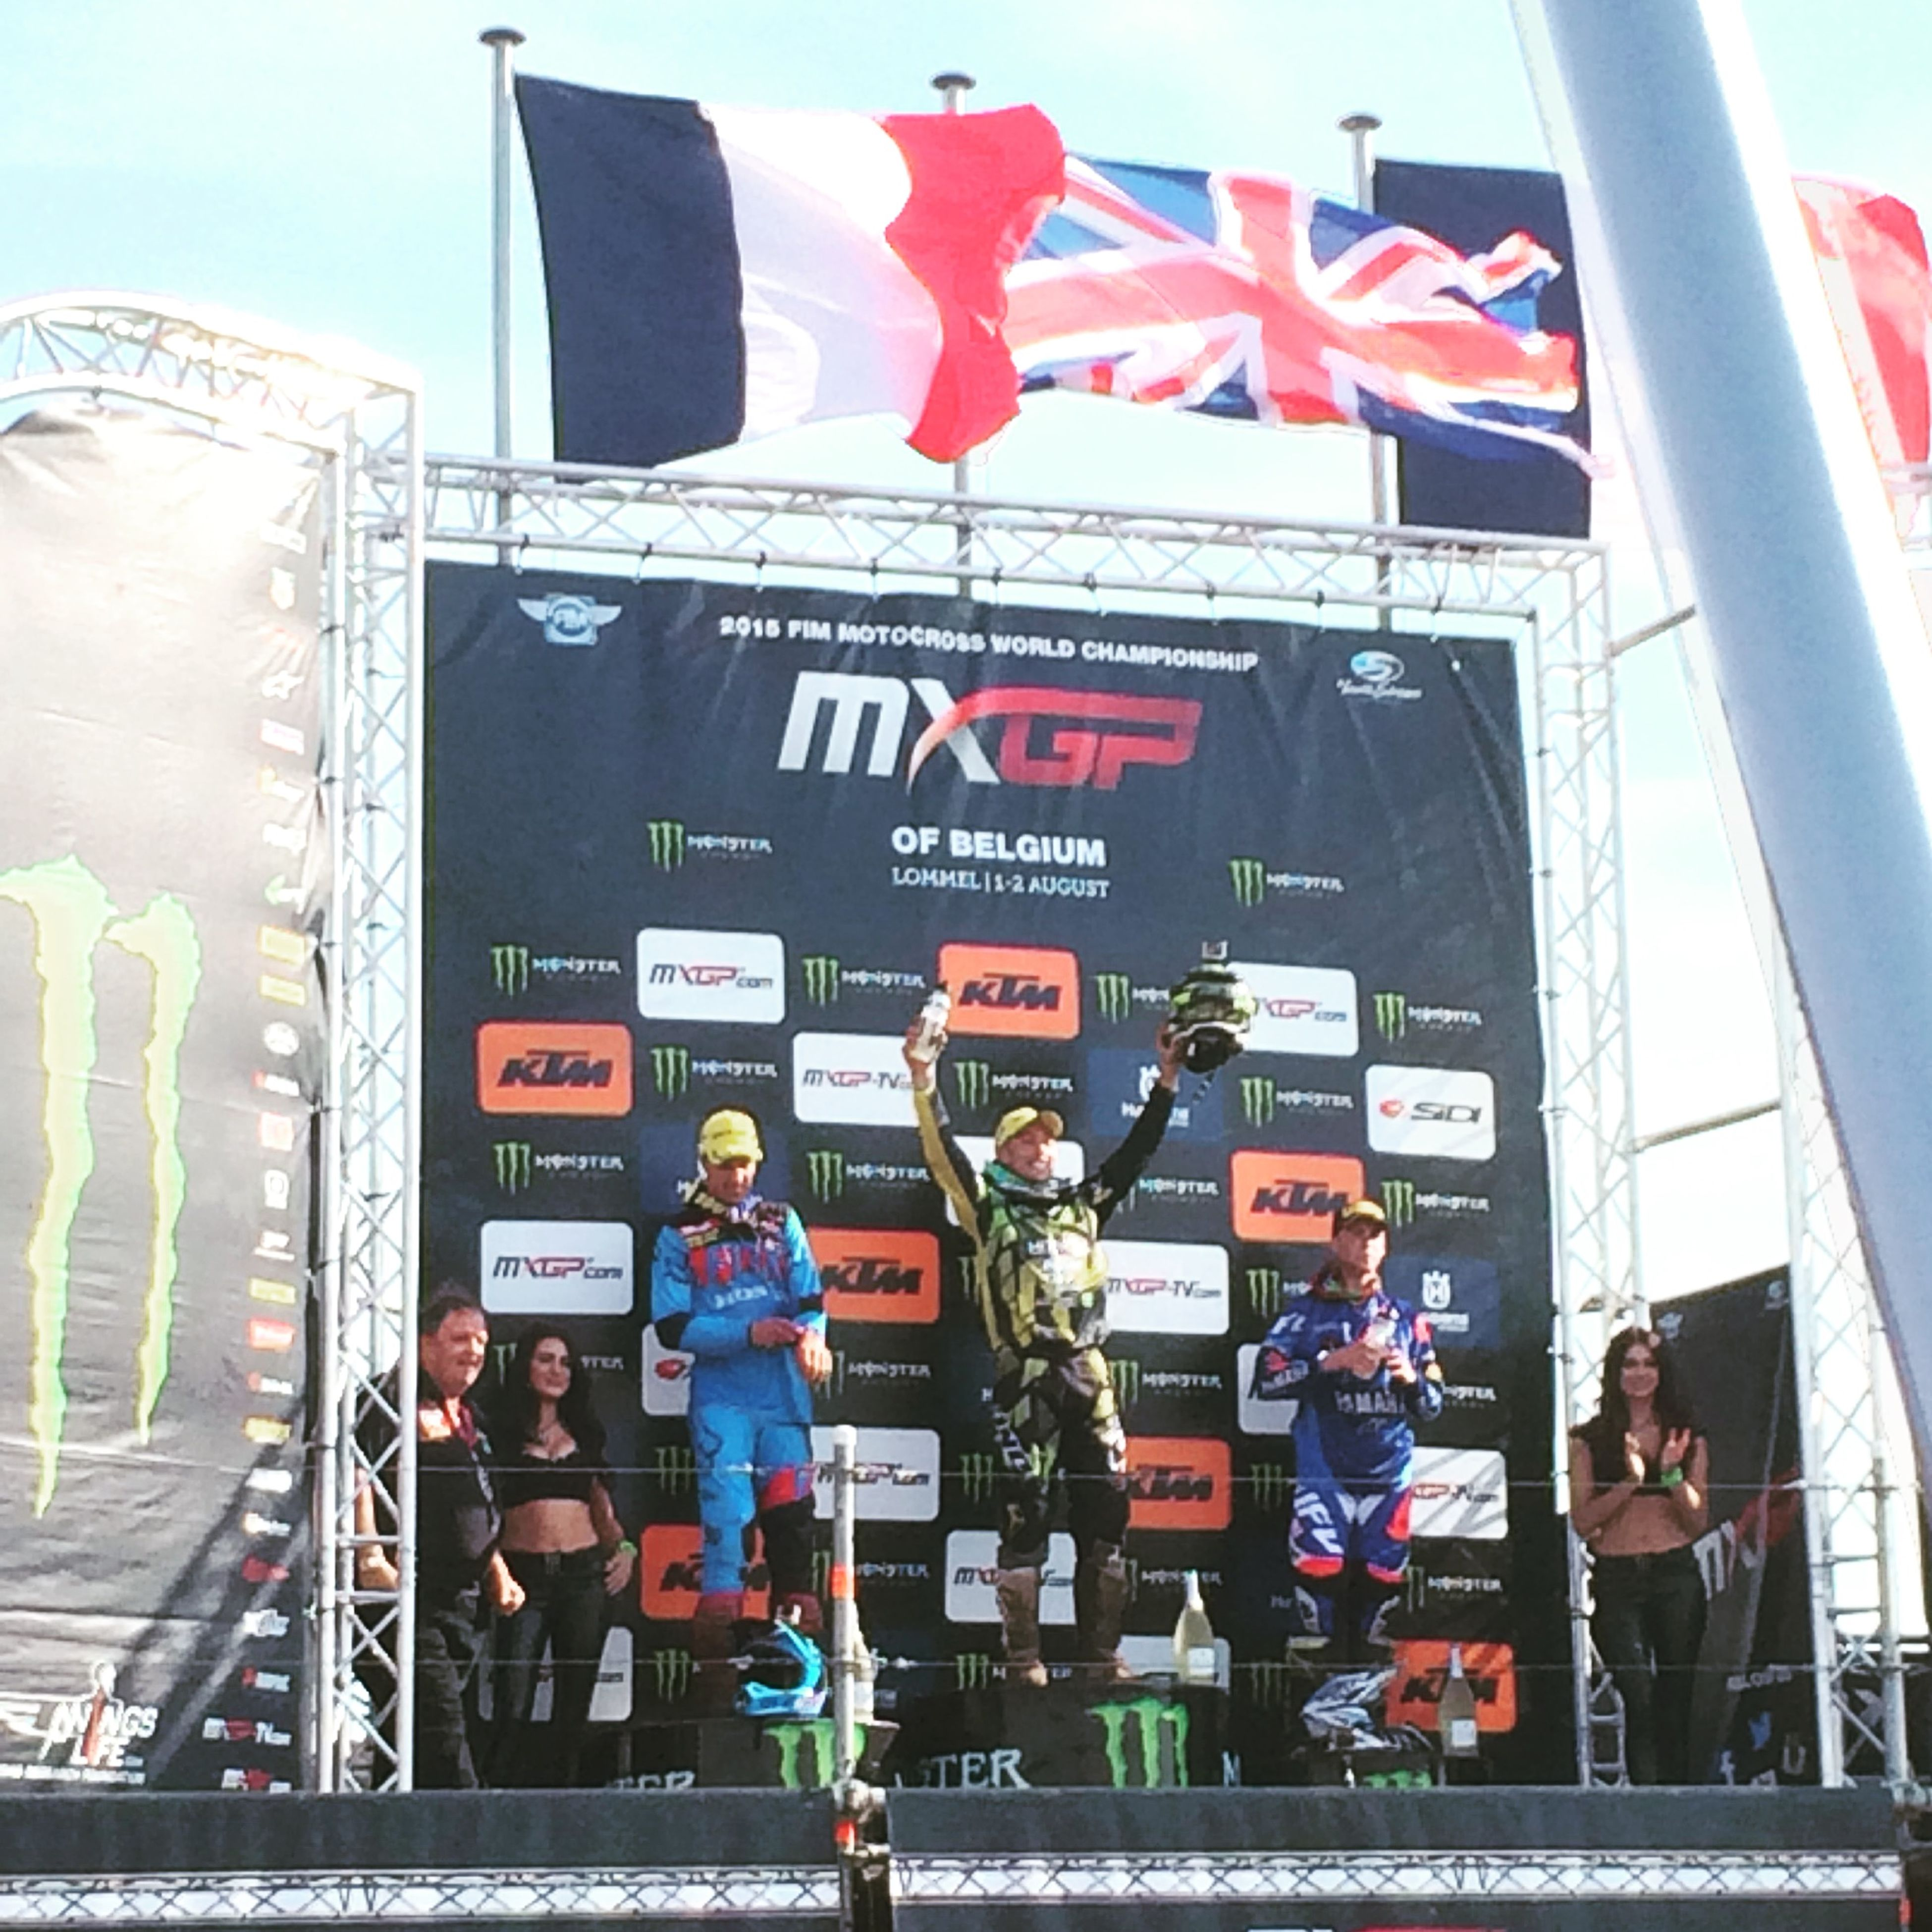 Motocross Race Mxgp Belgium